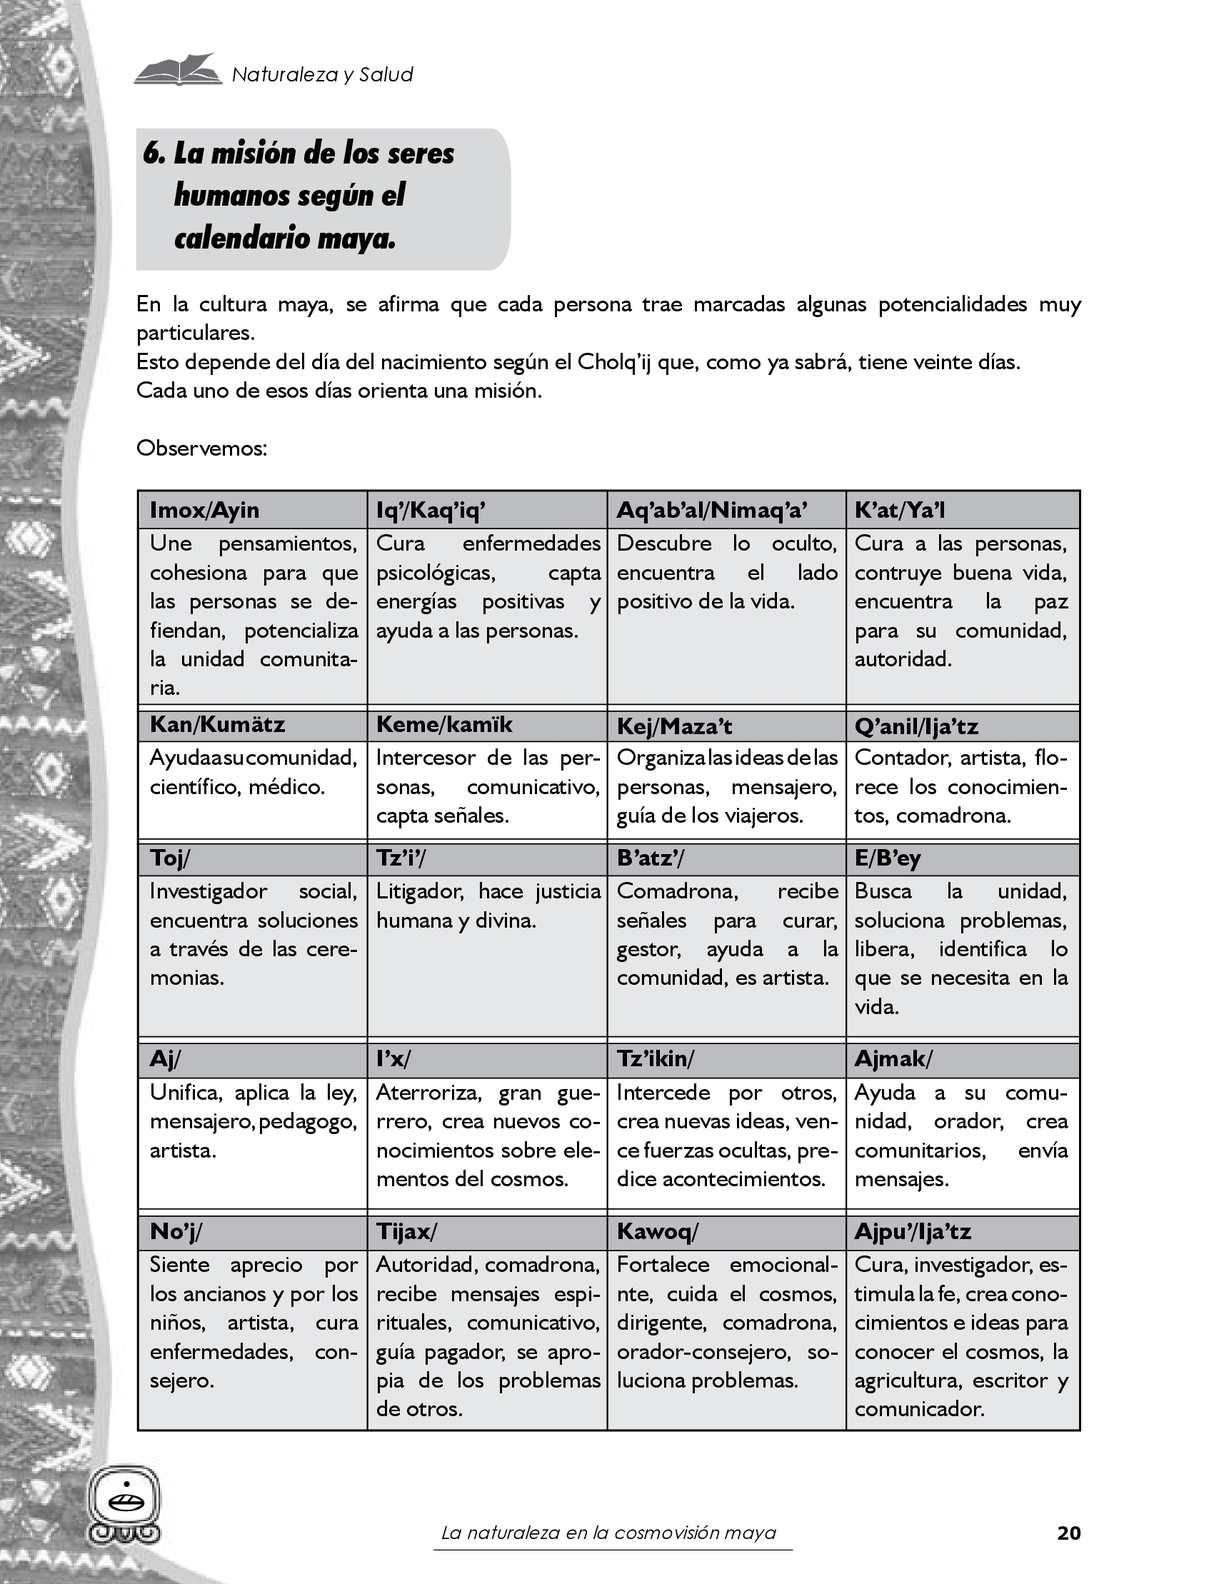 Naturaleza y Salud - CALAMEO Downloader